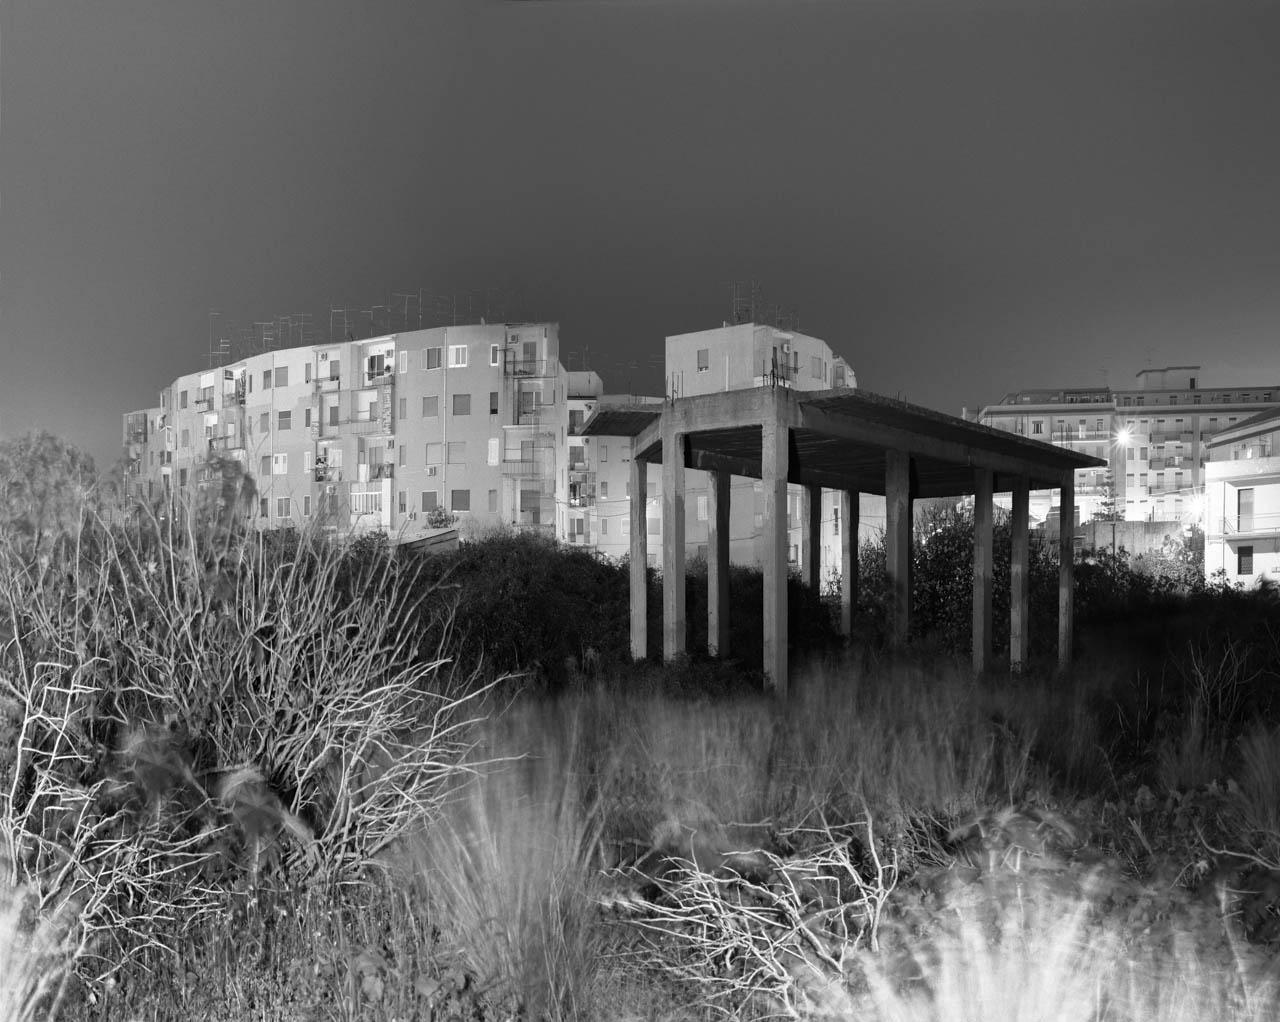 Siracusa, 2005